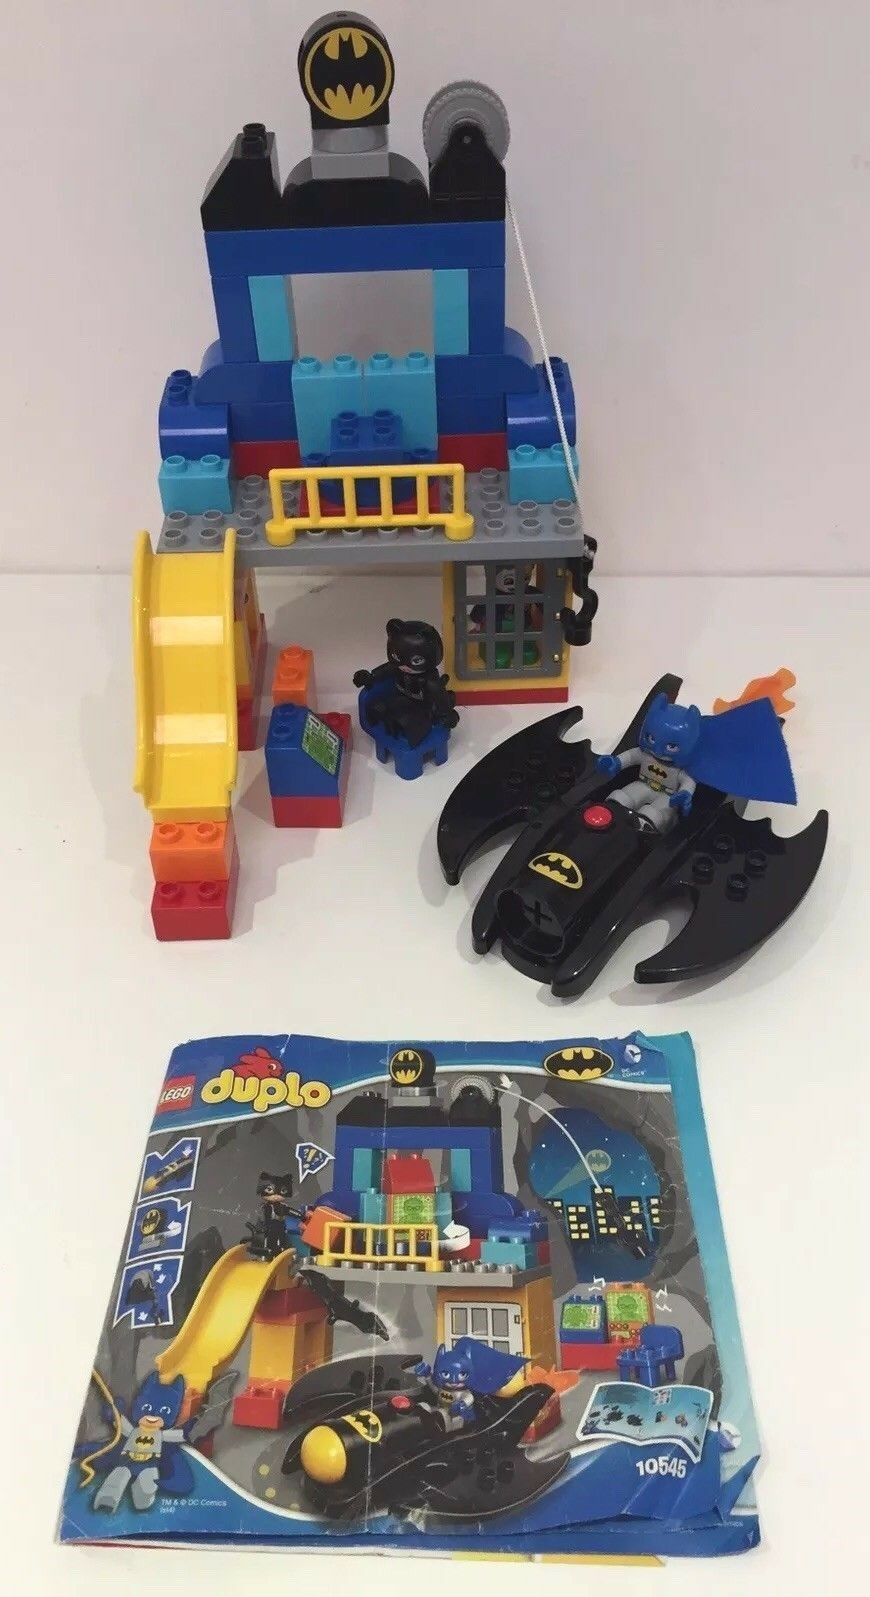 BATMAN LEGO DUPLO BATCAVE ADVENTURES JOKER ROBIN BATWING FIGURES SET 10545